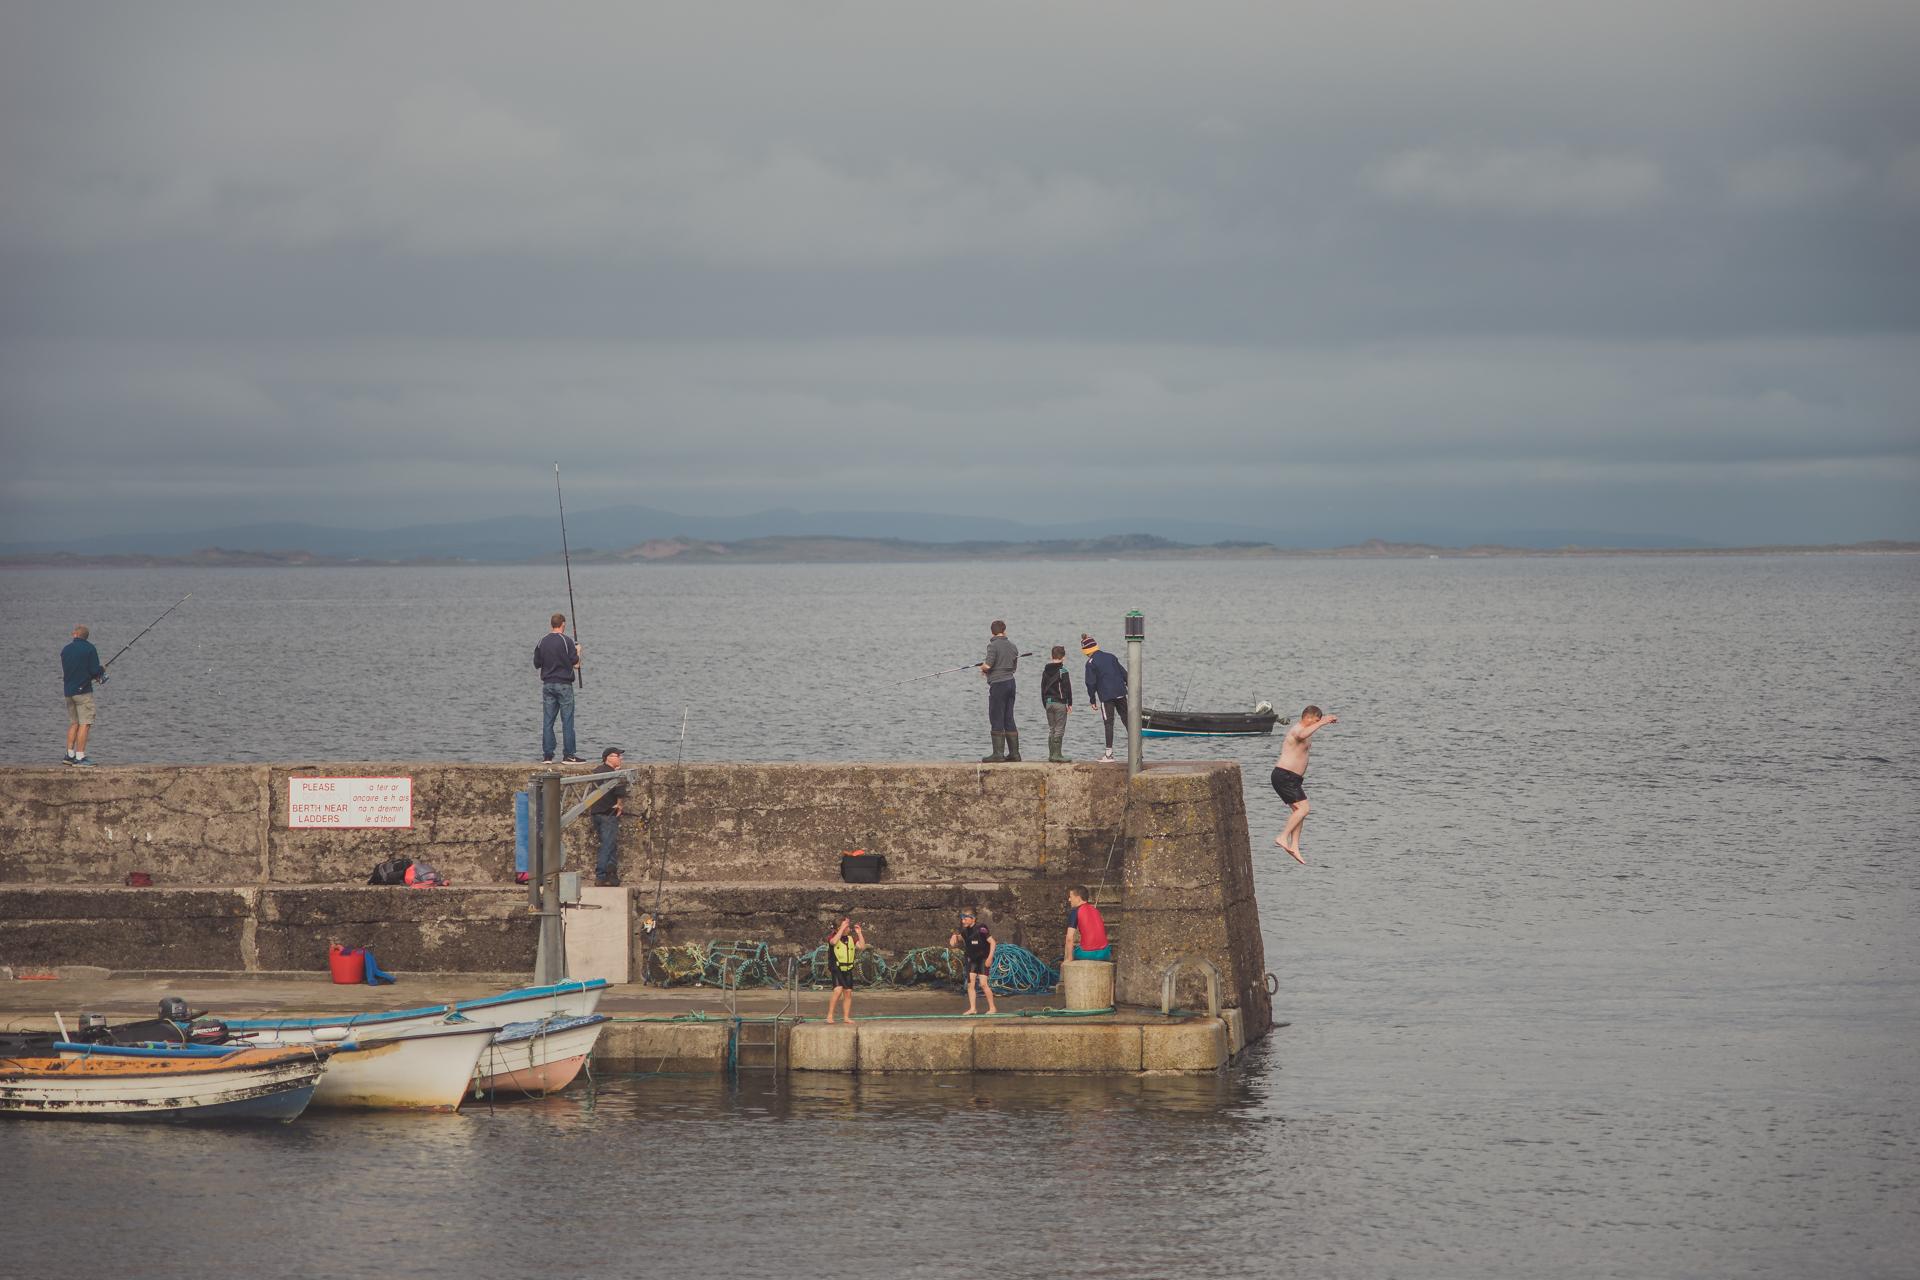 Ireland. Wild Atlantic Way. Kerry. Counthy Kerry. Travel photography. Landscape photography. Blog. Irish. Travelling Ireland. Ireland west coast. Wild Landscape. Trip. Vacation. -9.jpg